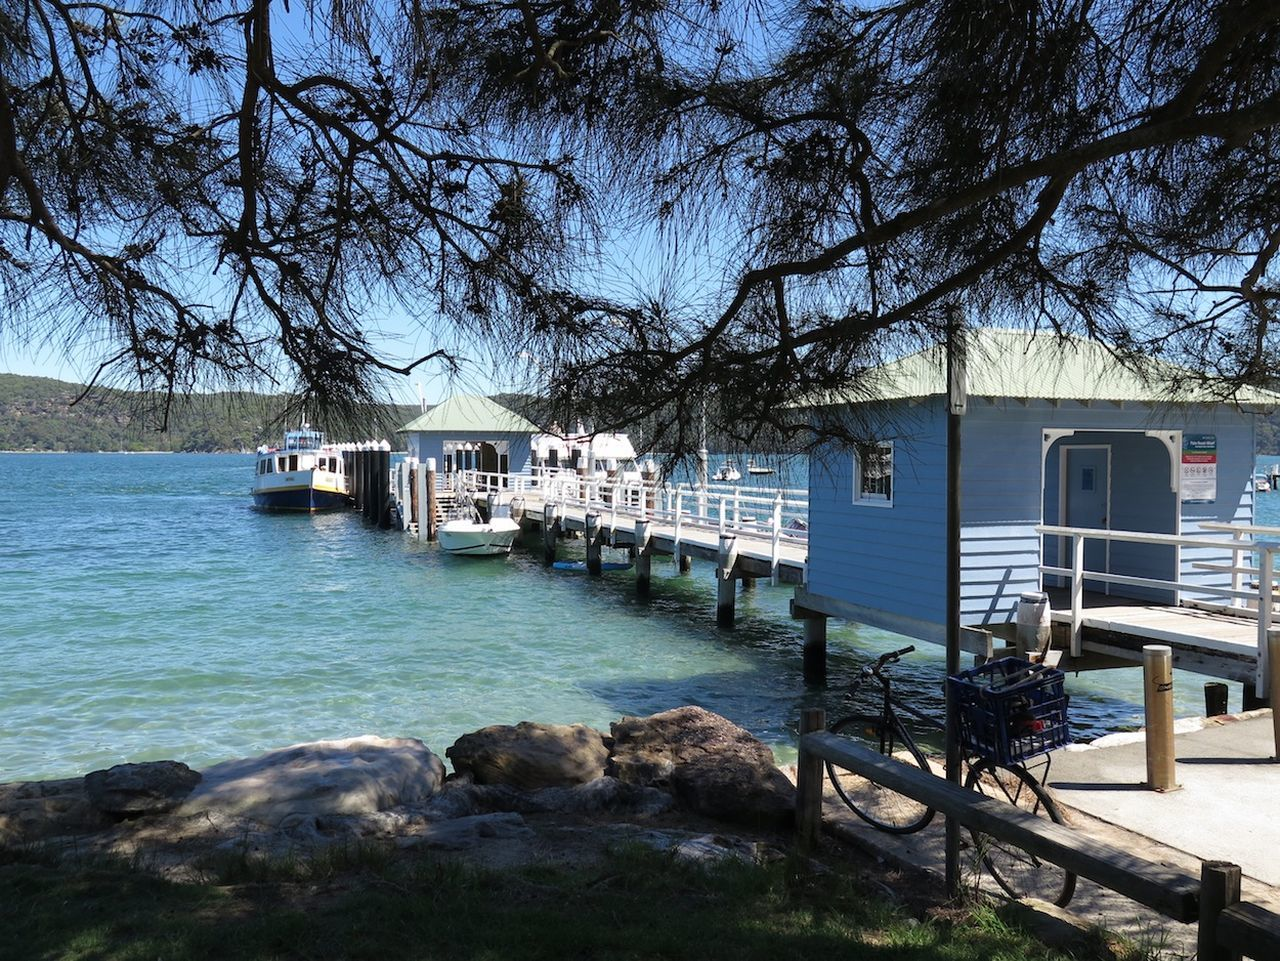 Australia Australian Beauty Palm Beach Wharf Pier Australia & Travel Boat Trip